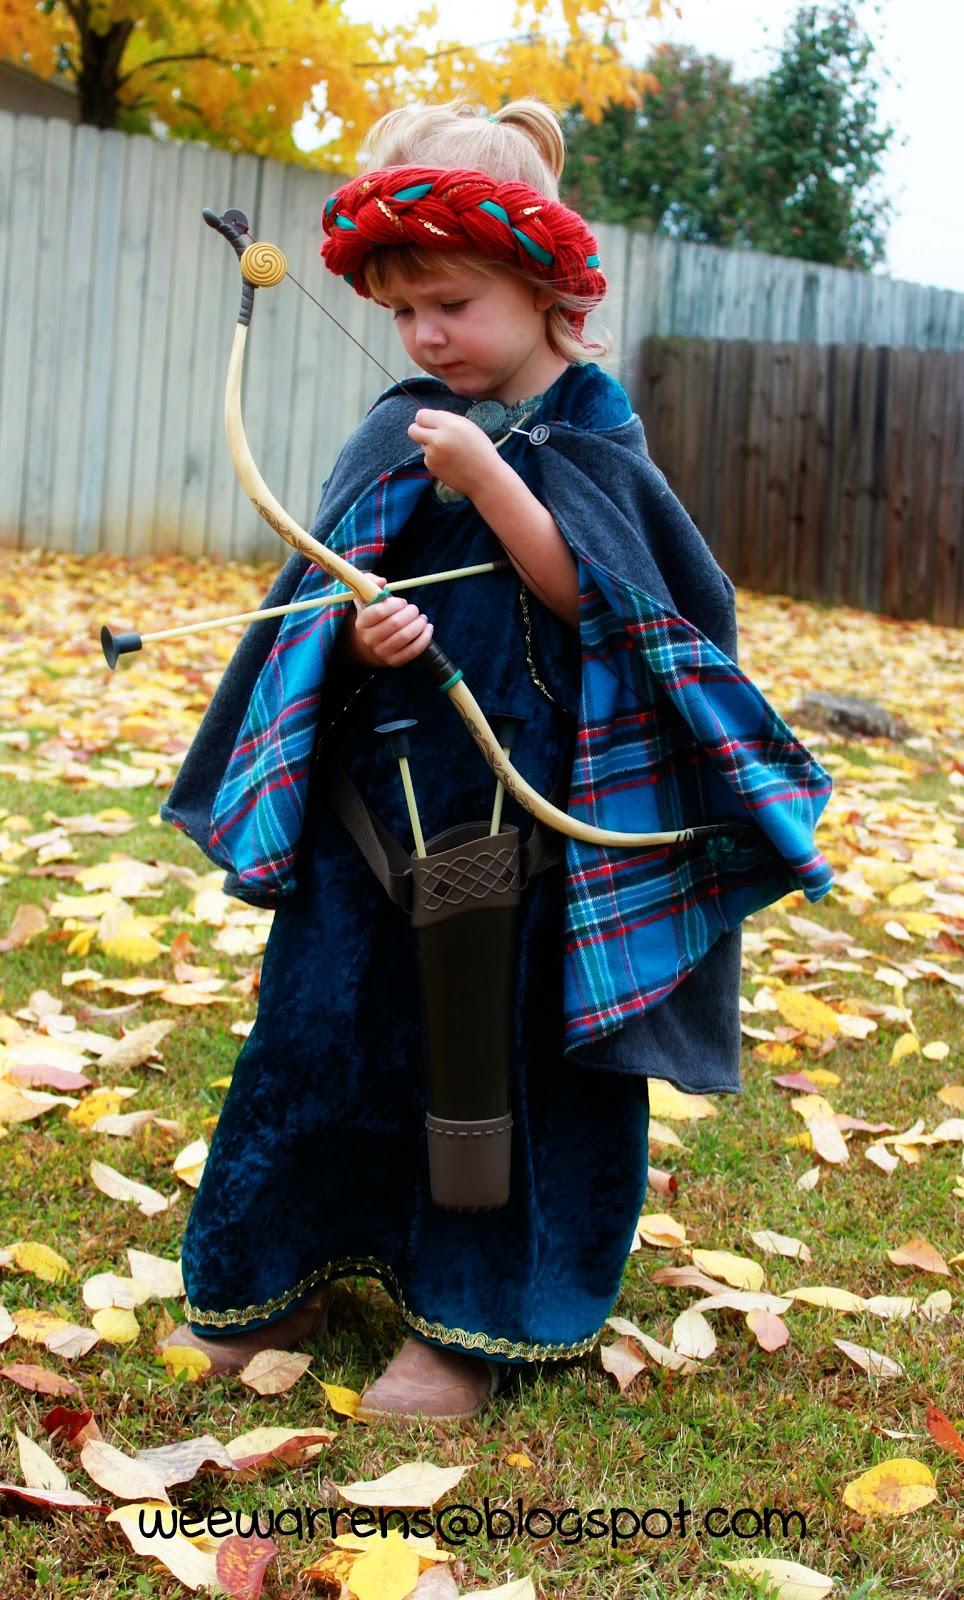 Halloween Costumes! Braveu0027s Merida (and Baby Bear) Costume using free patterns  sc 1 st  Wee Warrens & Wee Warrens: Halloween Costumes! Braveu0027s Merida (and Baby Bear ...